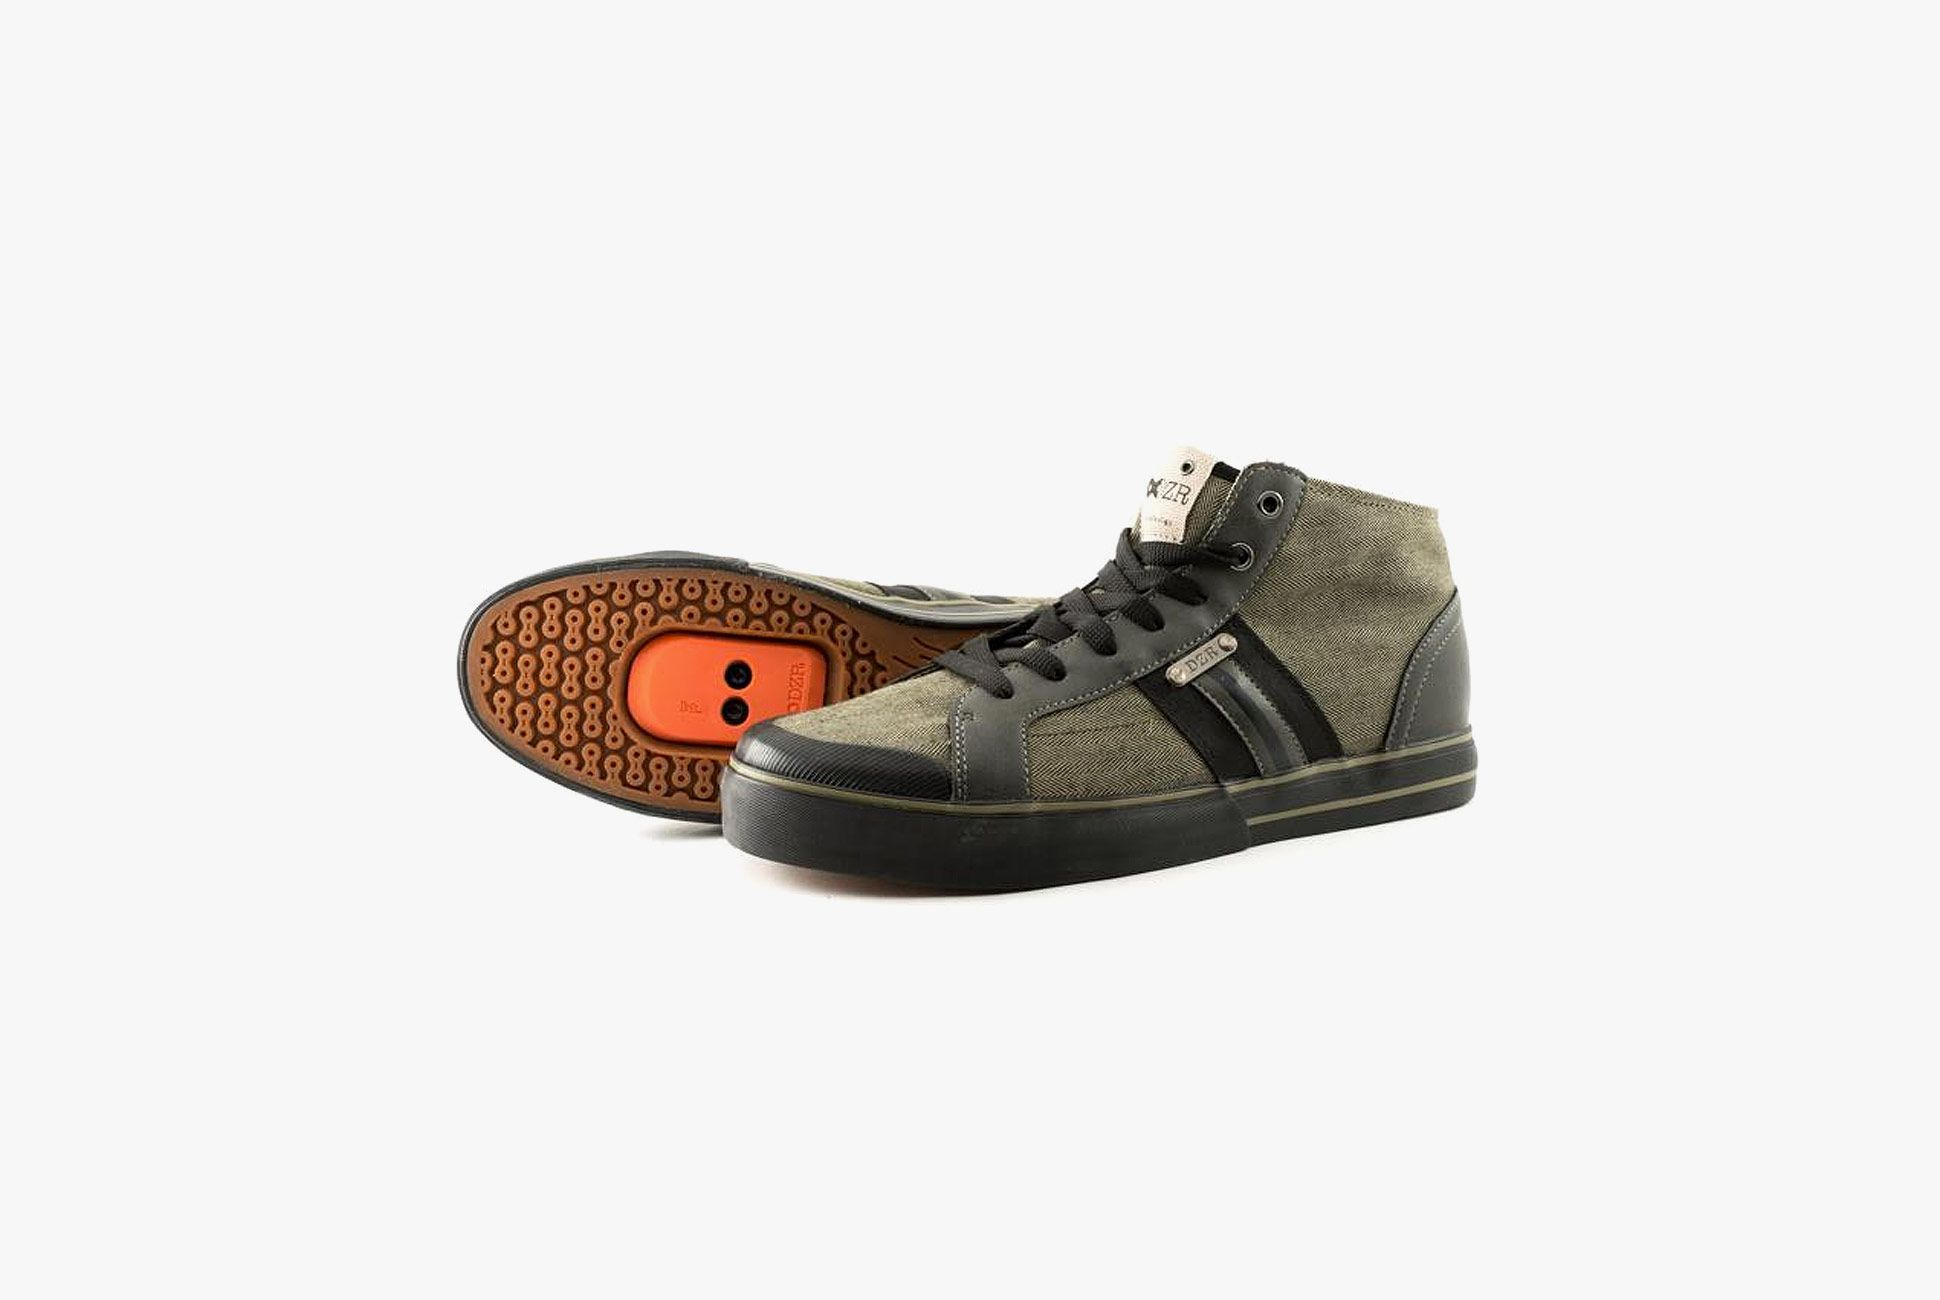 DZR-Shoes-gear-patrol-6